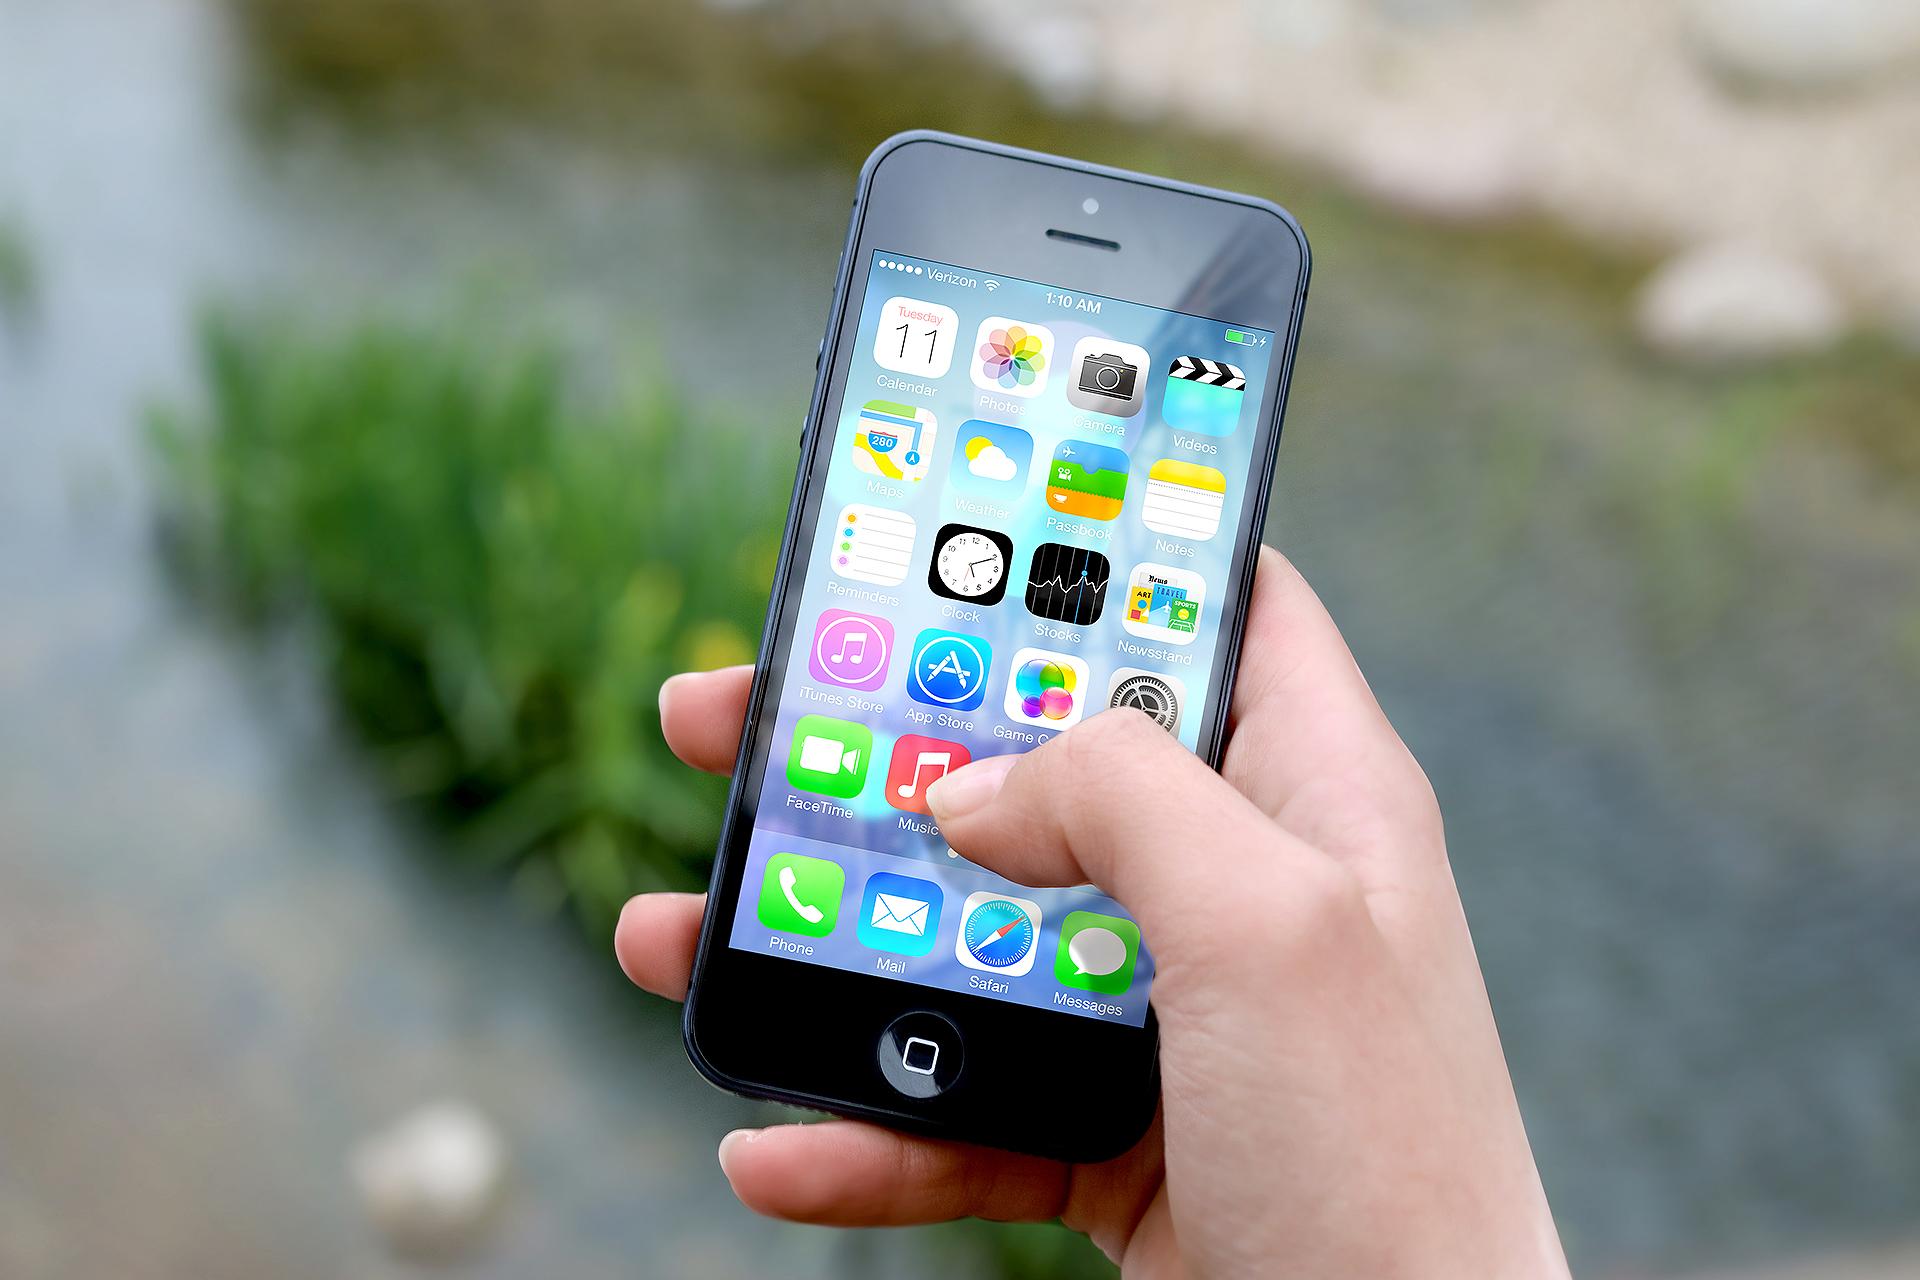 iphone-app-keeps-freezing